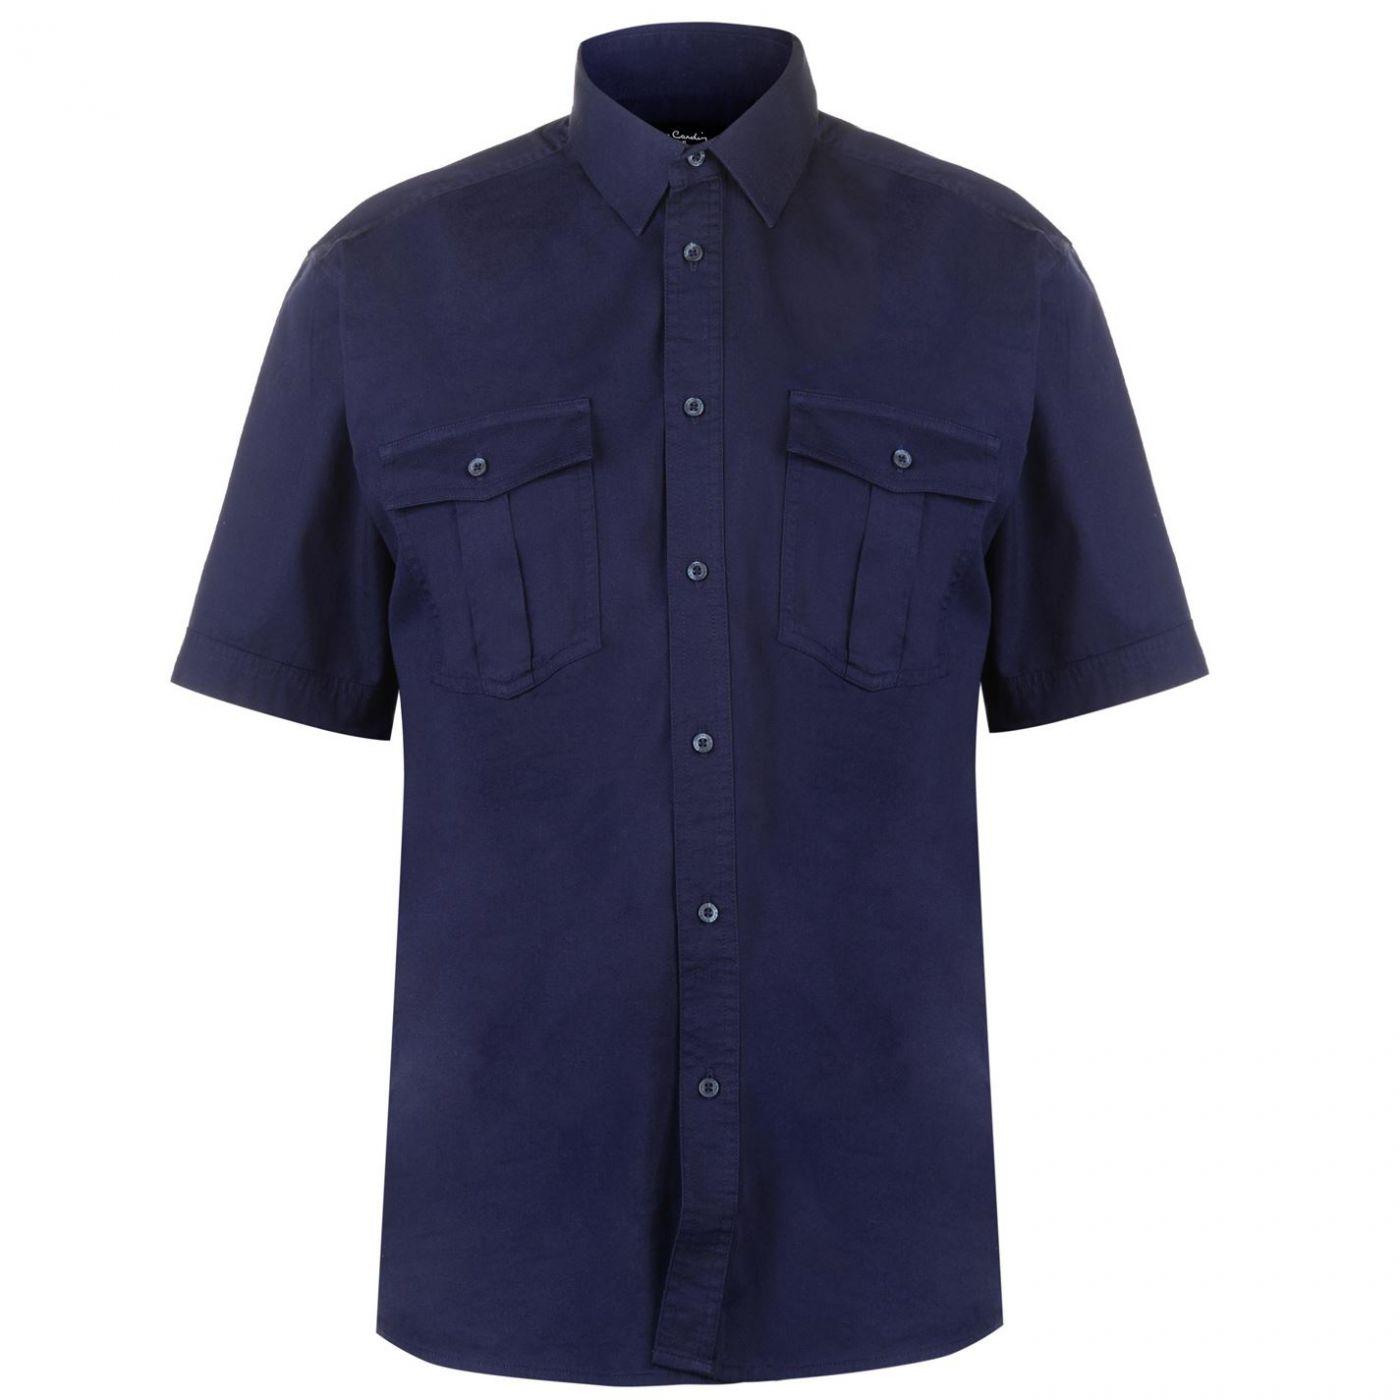 Pierre Cardin Military Short Sleeve Shirt Mens